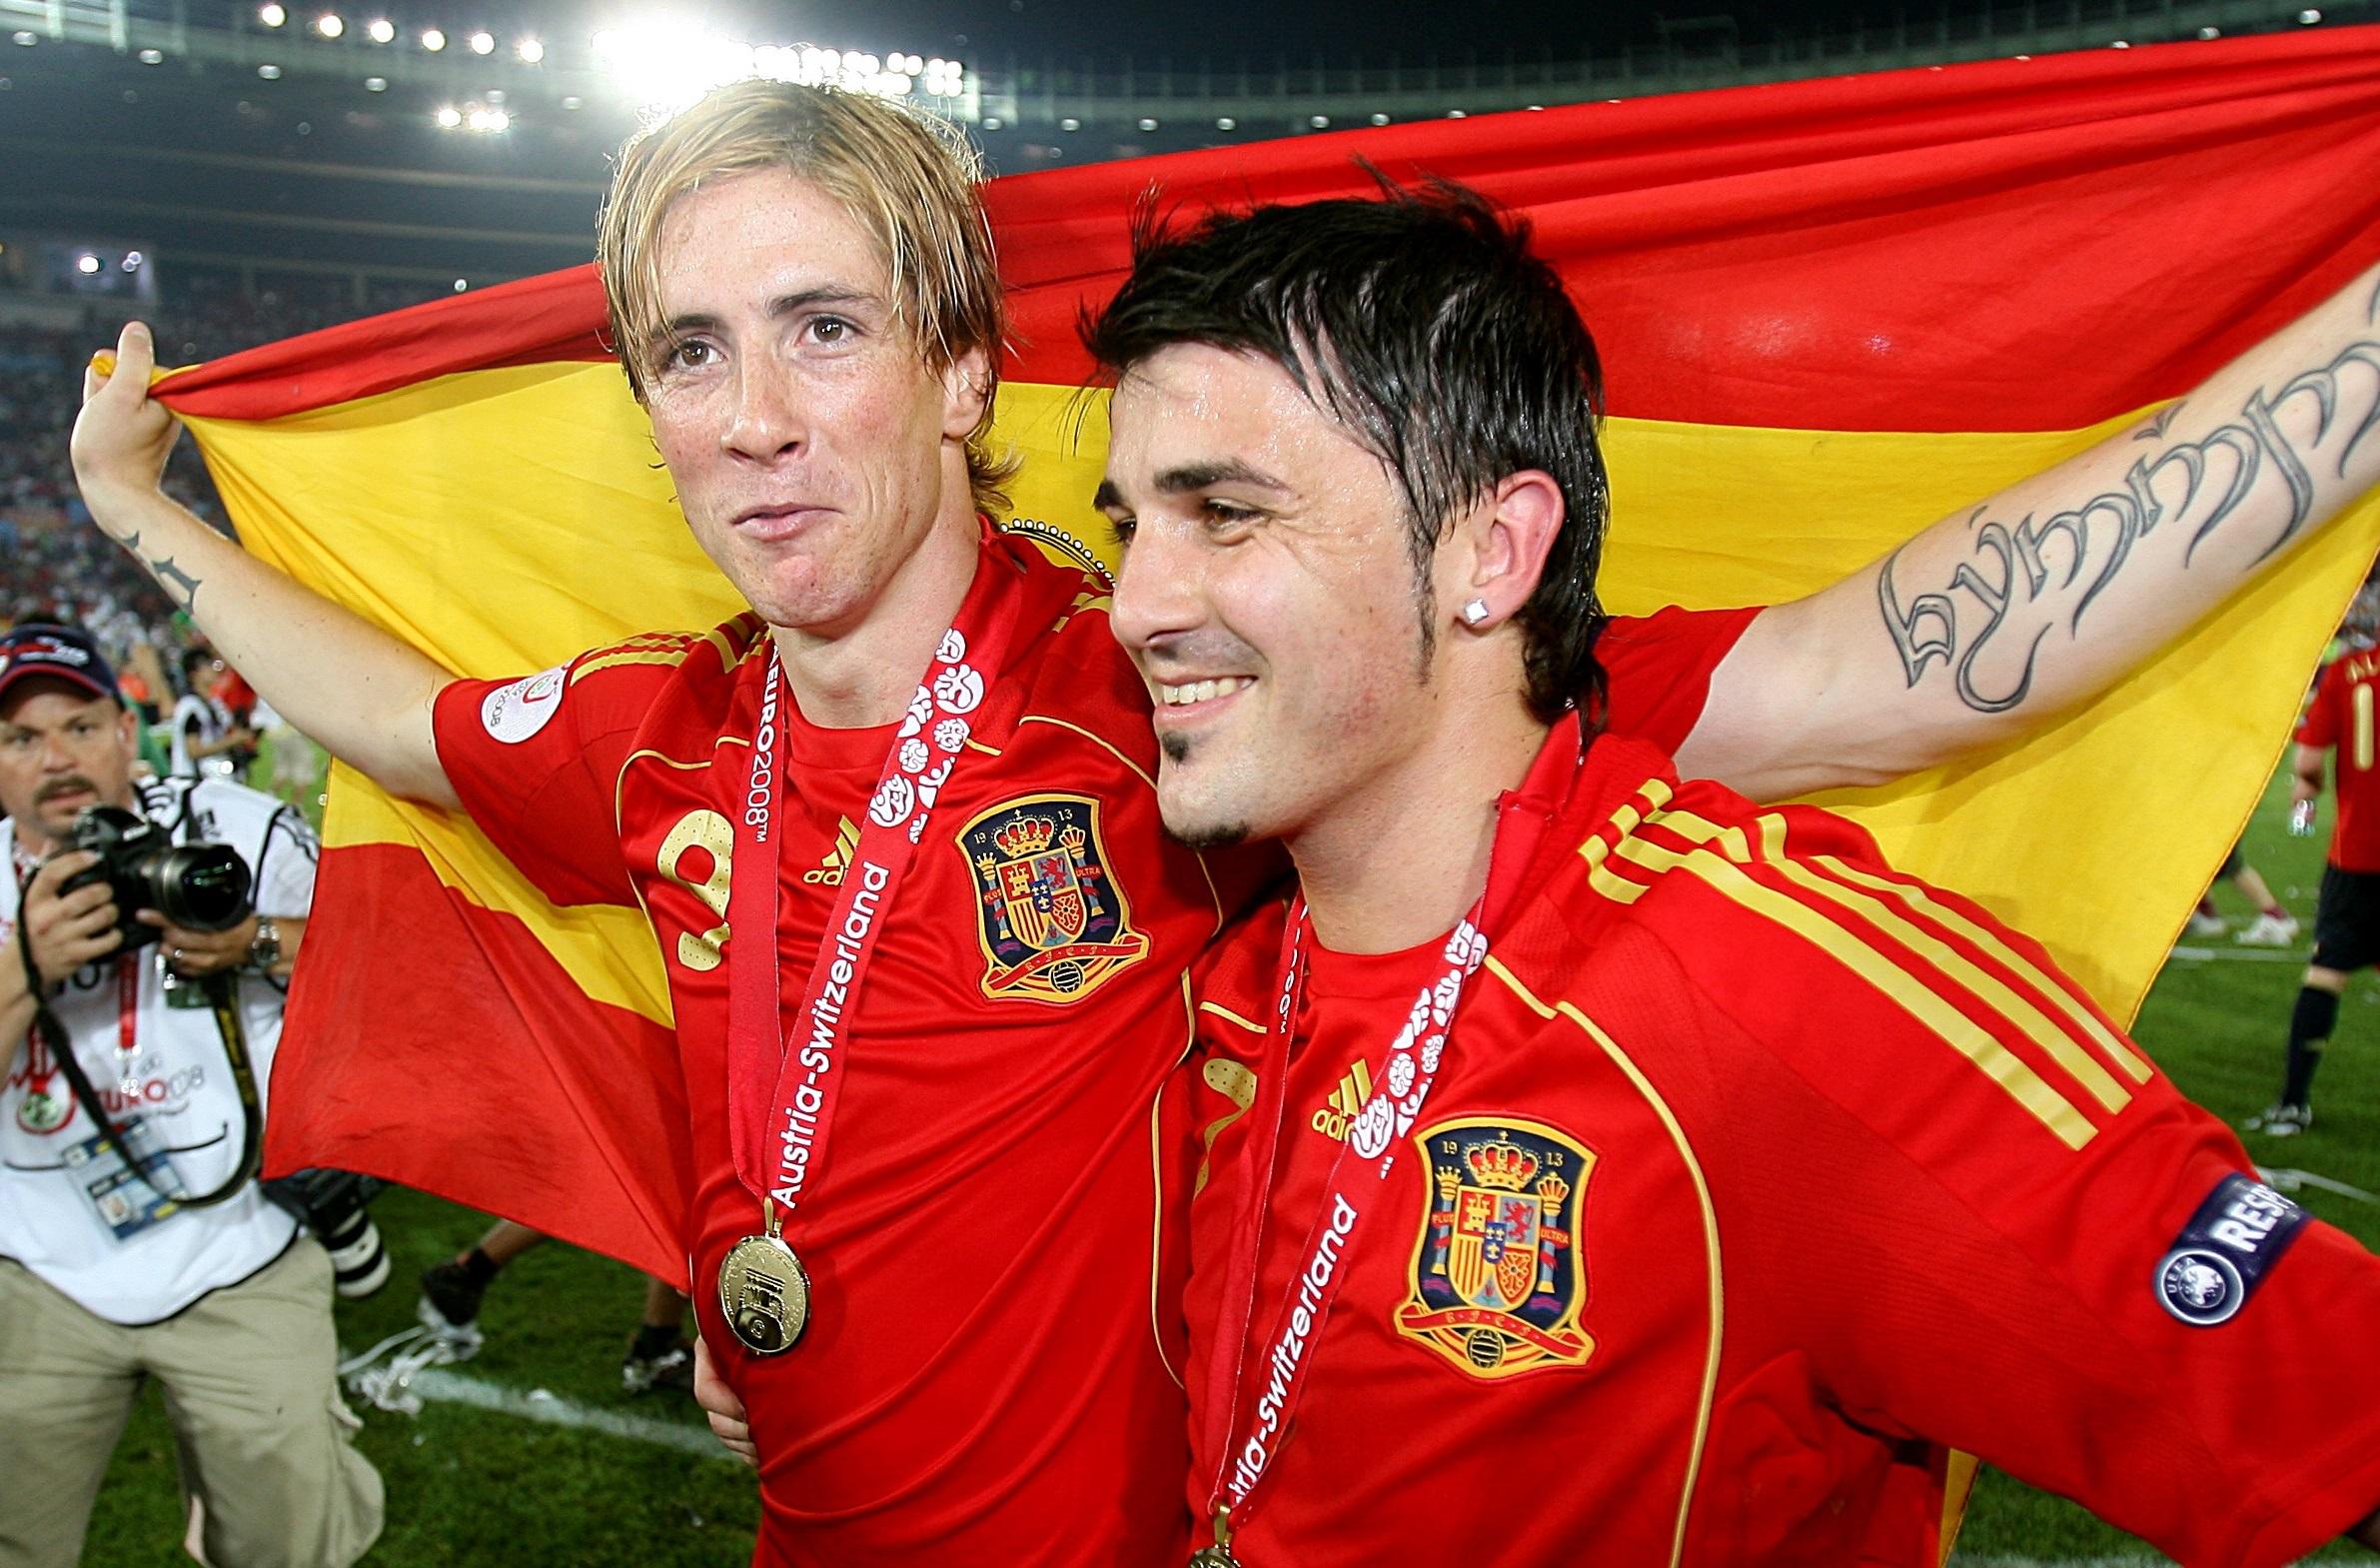 اسپانیا / یورو 2008 / لاروخا / La Roja / Spain / EURO 2008